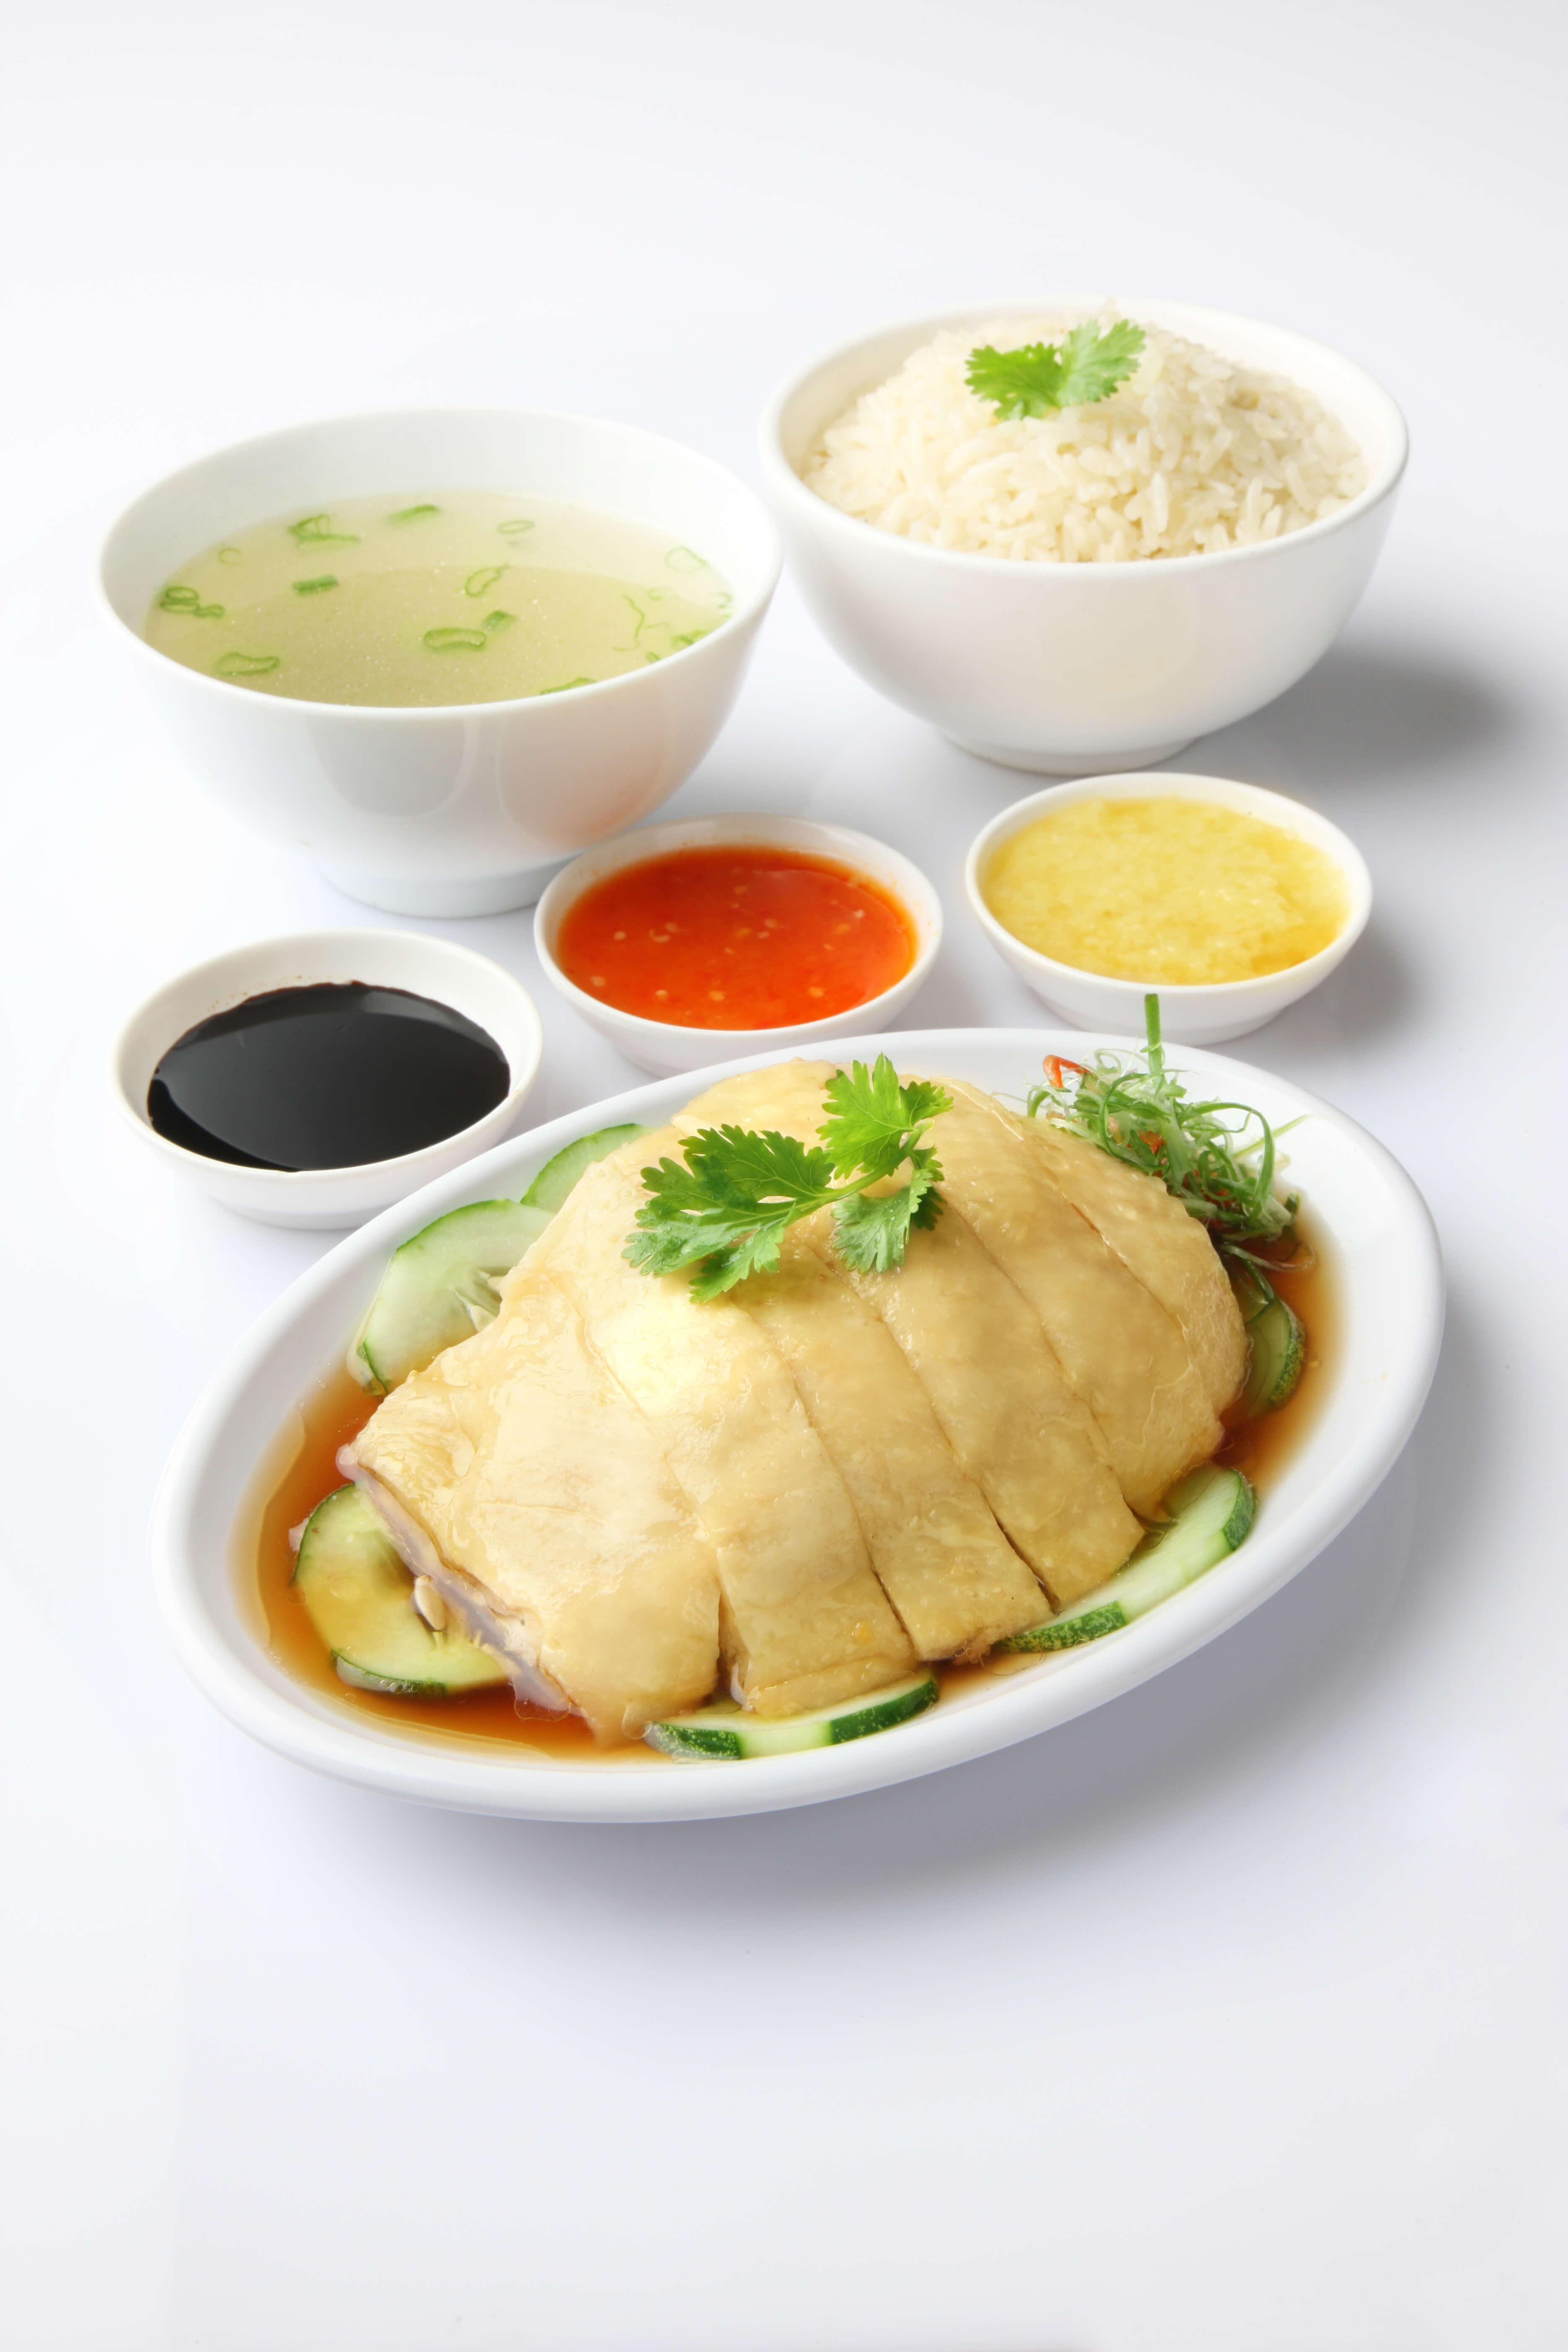 Chix Rice(extra Pix) Adj